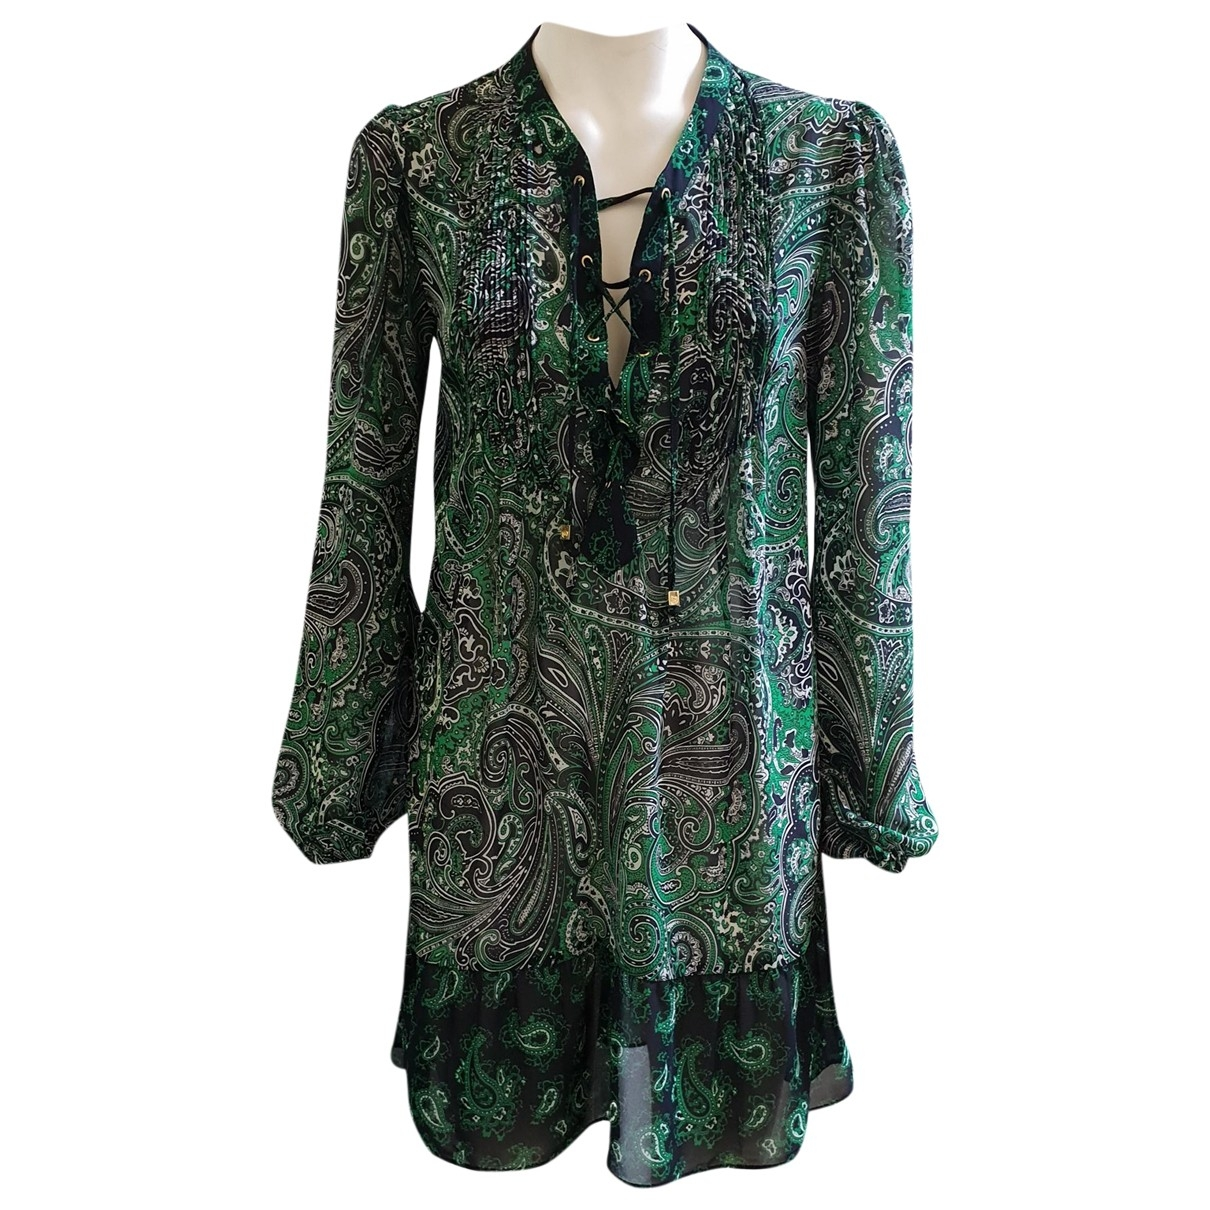 Michael Kors \N Green dress for Women XS International